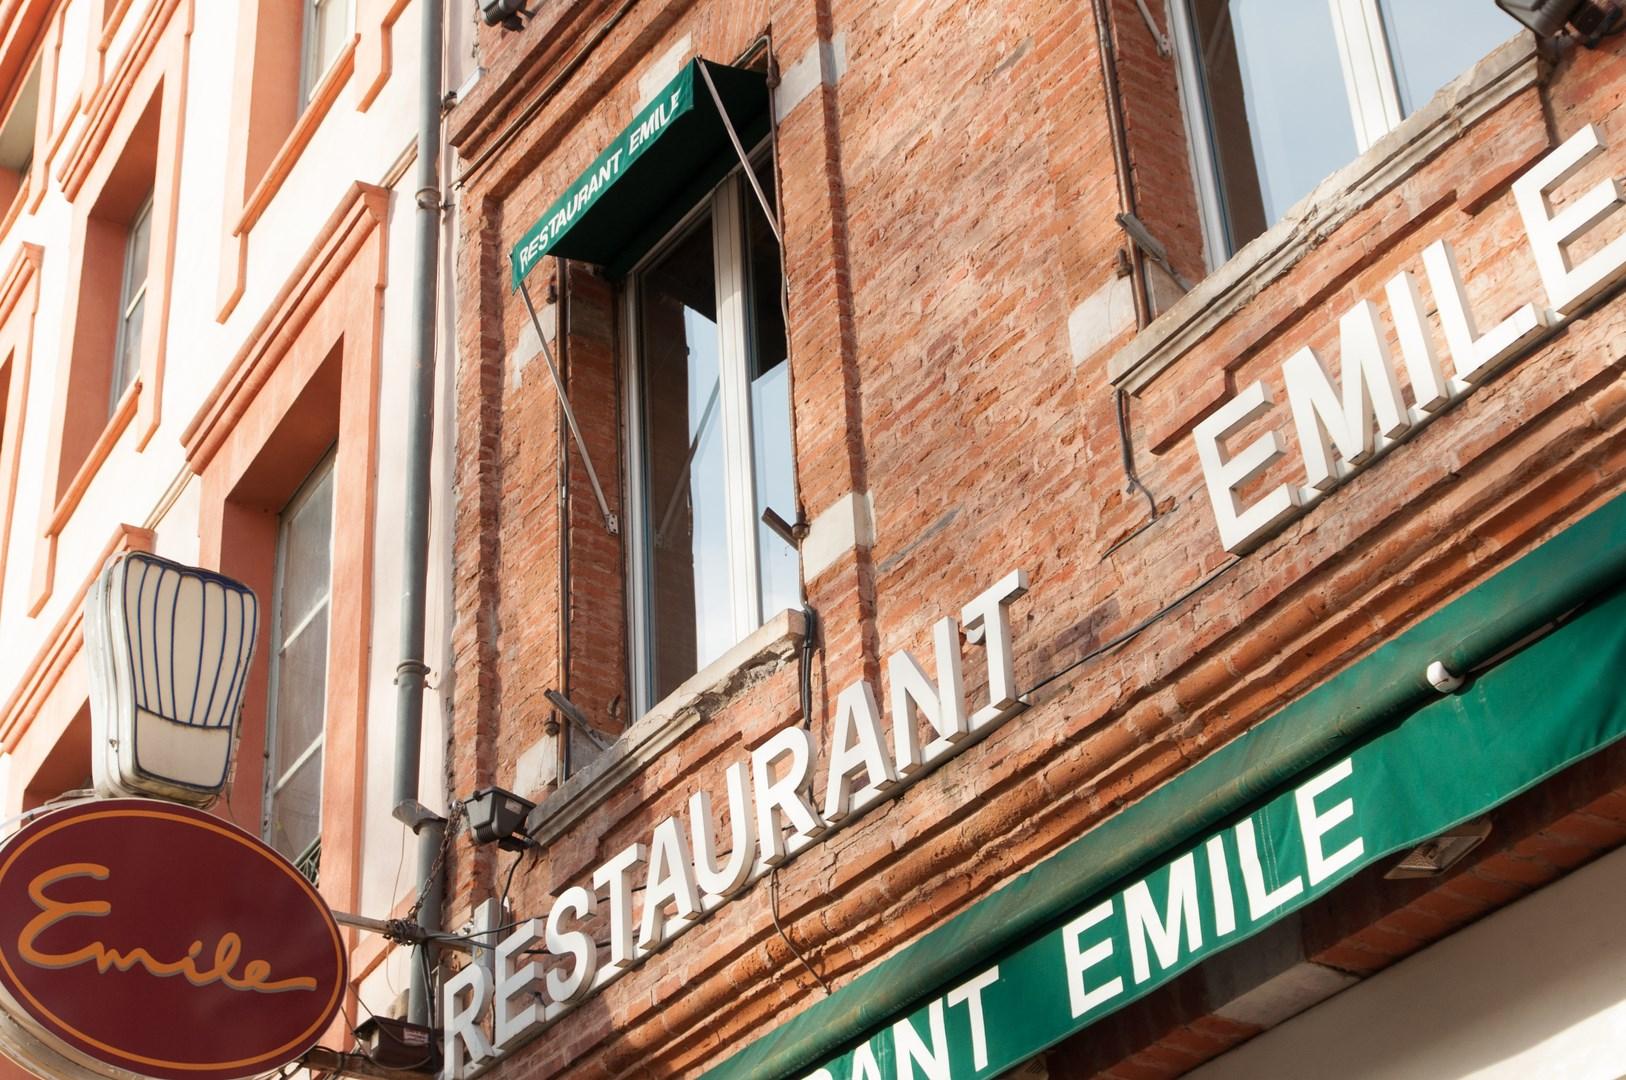 Restaurant Emile Toulouse